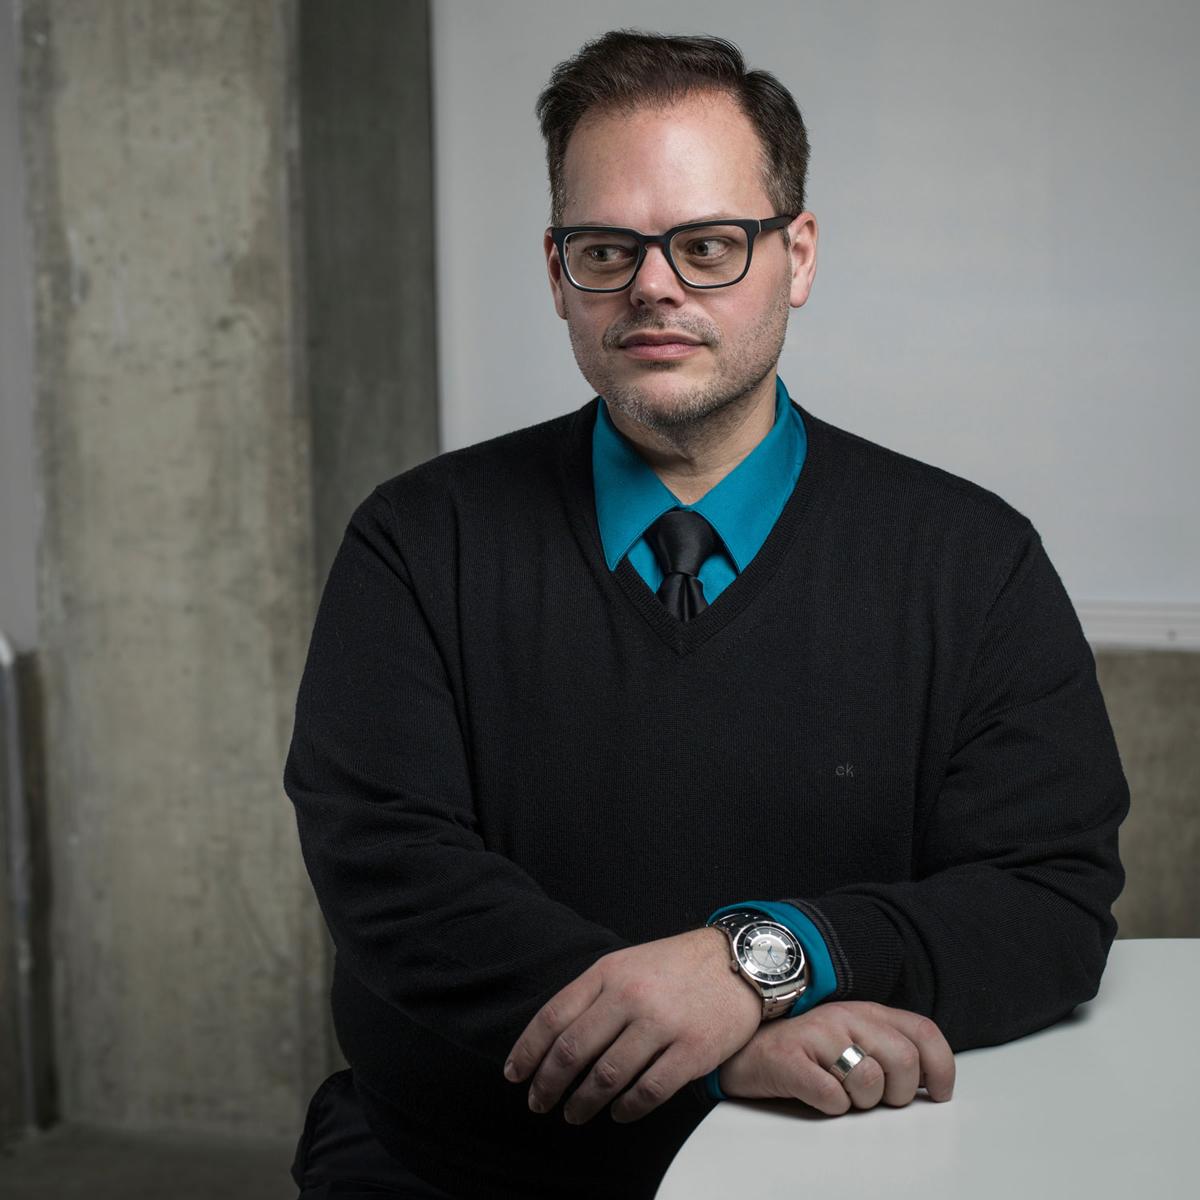 UICA Marketing & Communications Coordinator Chris Koens